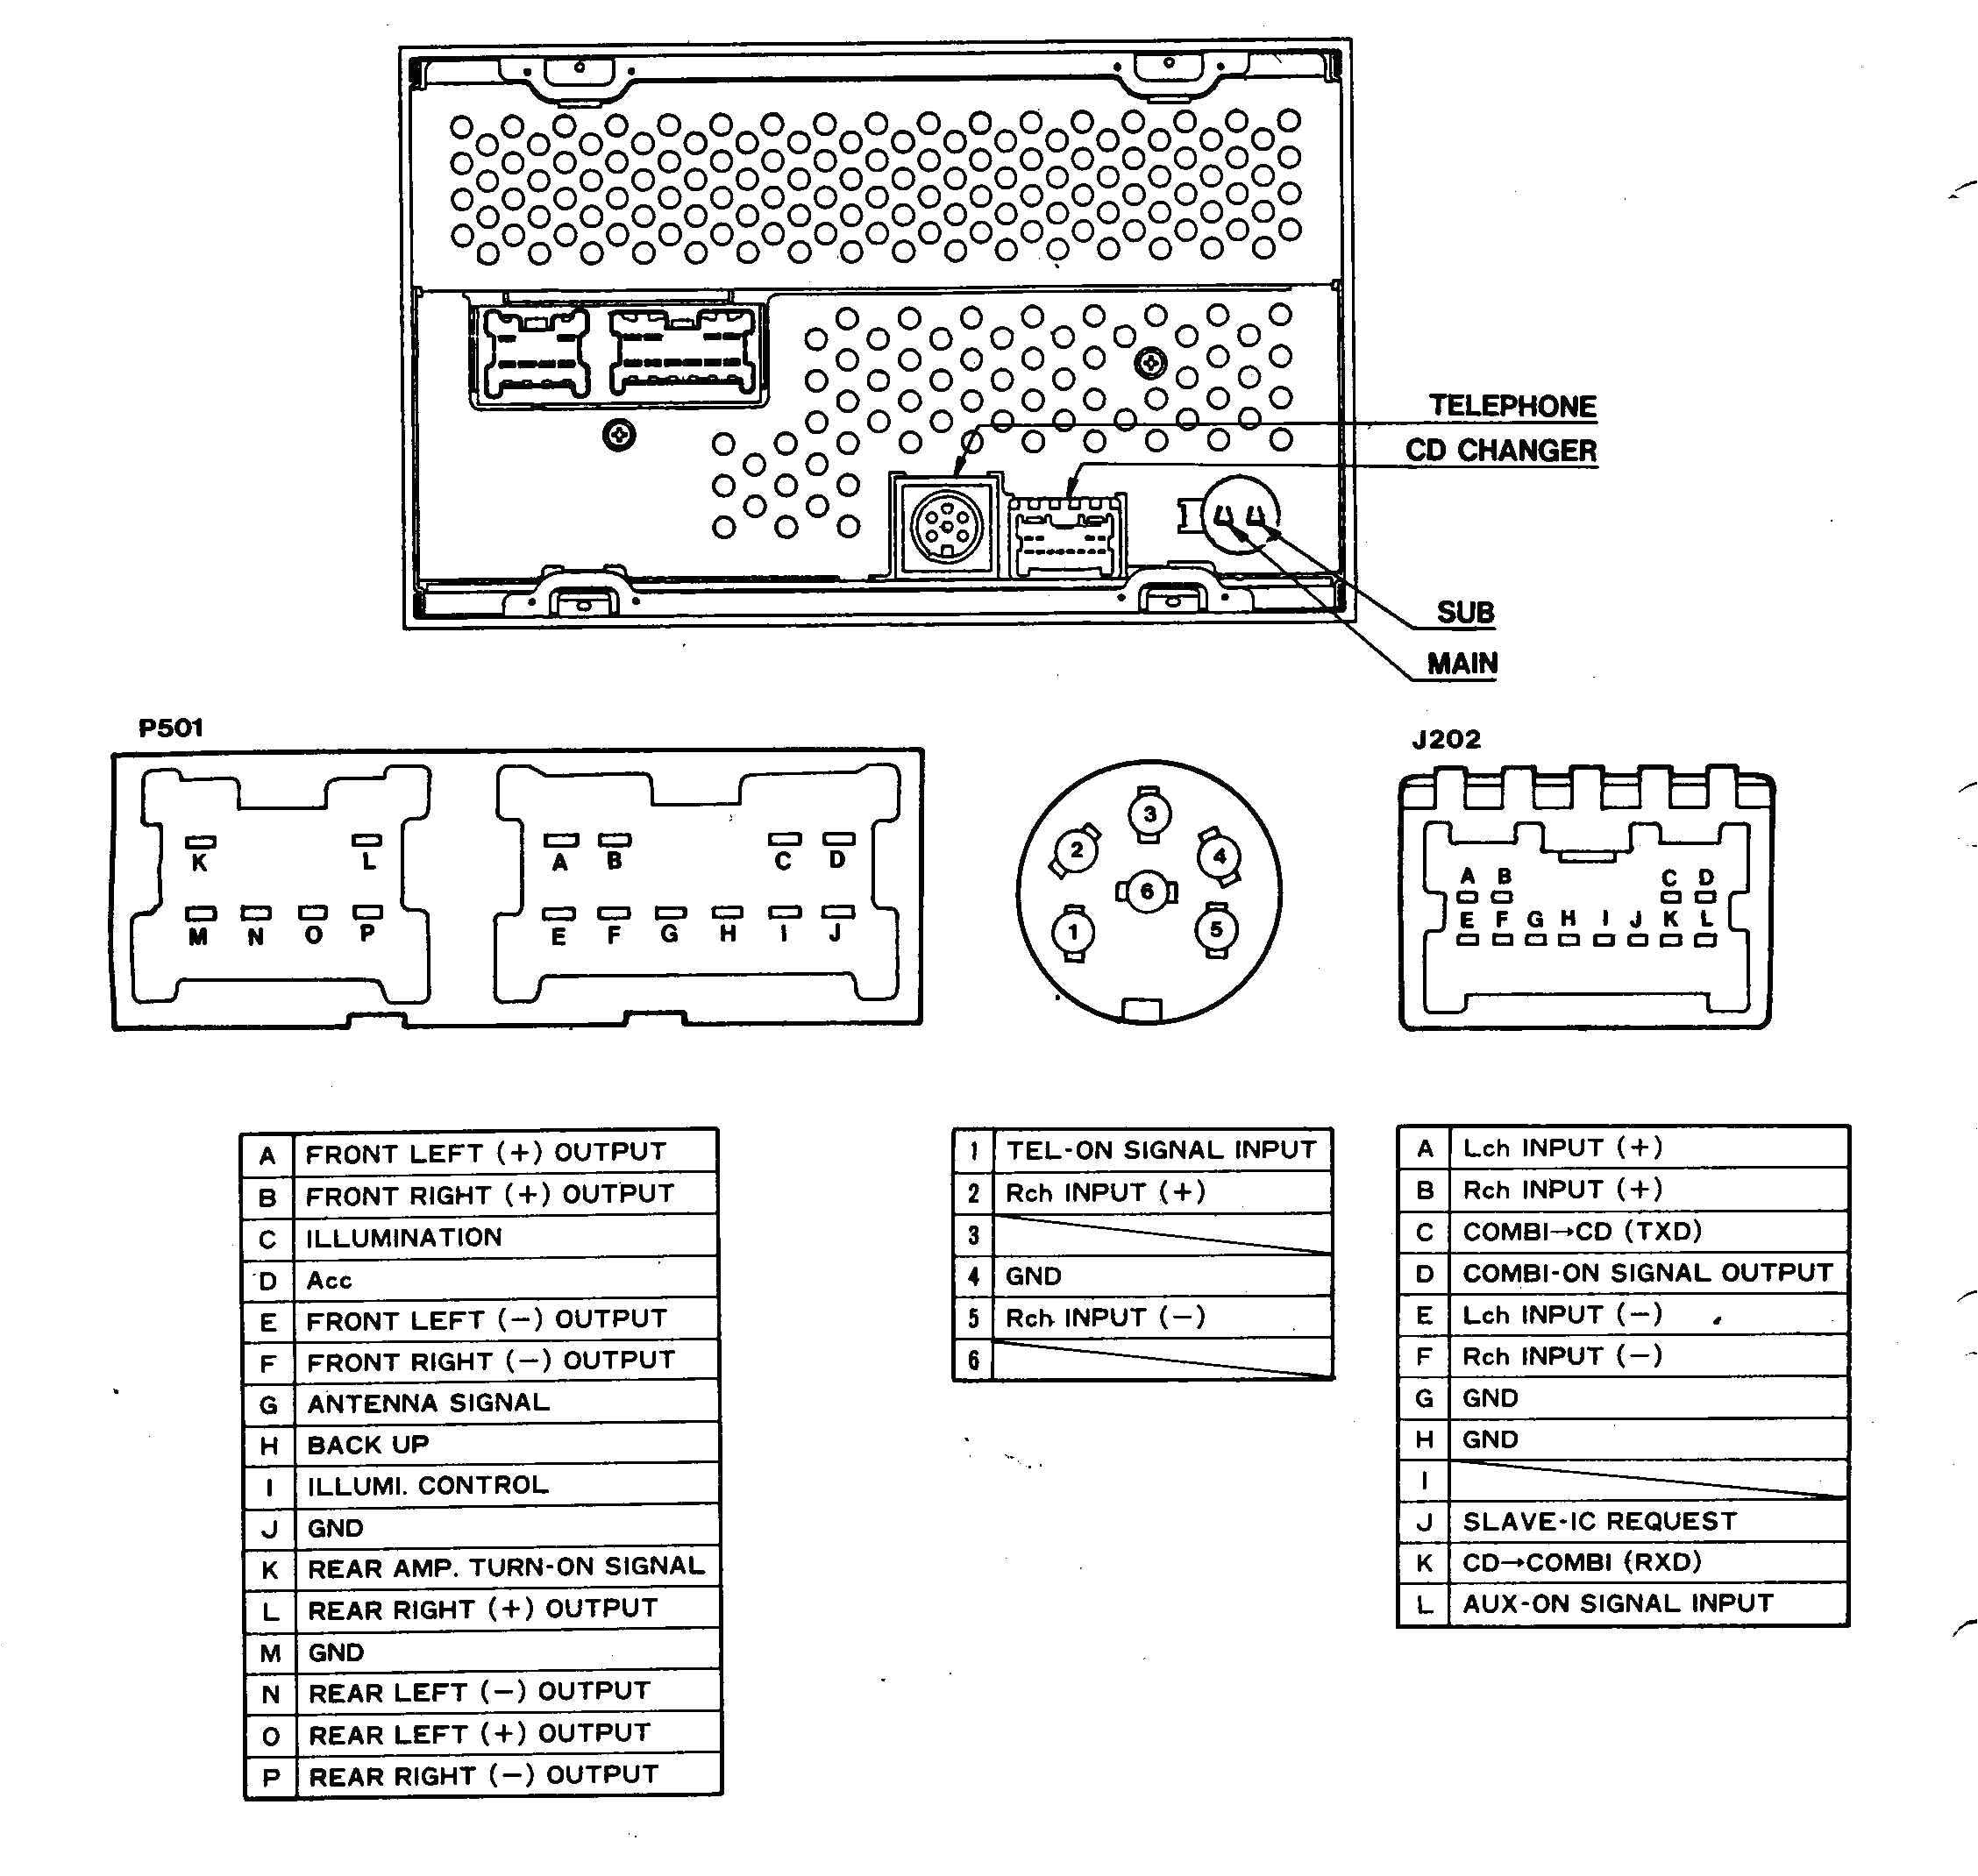 nissan car stereo wiring diagram wiring diagramnissan car radio wiring wiring diagram 2004 nissan sentra car